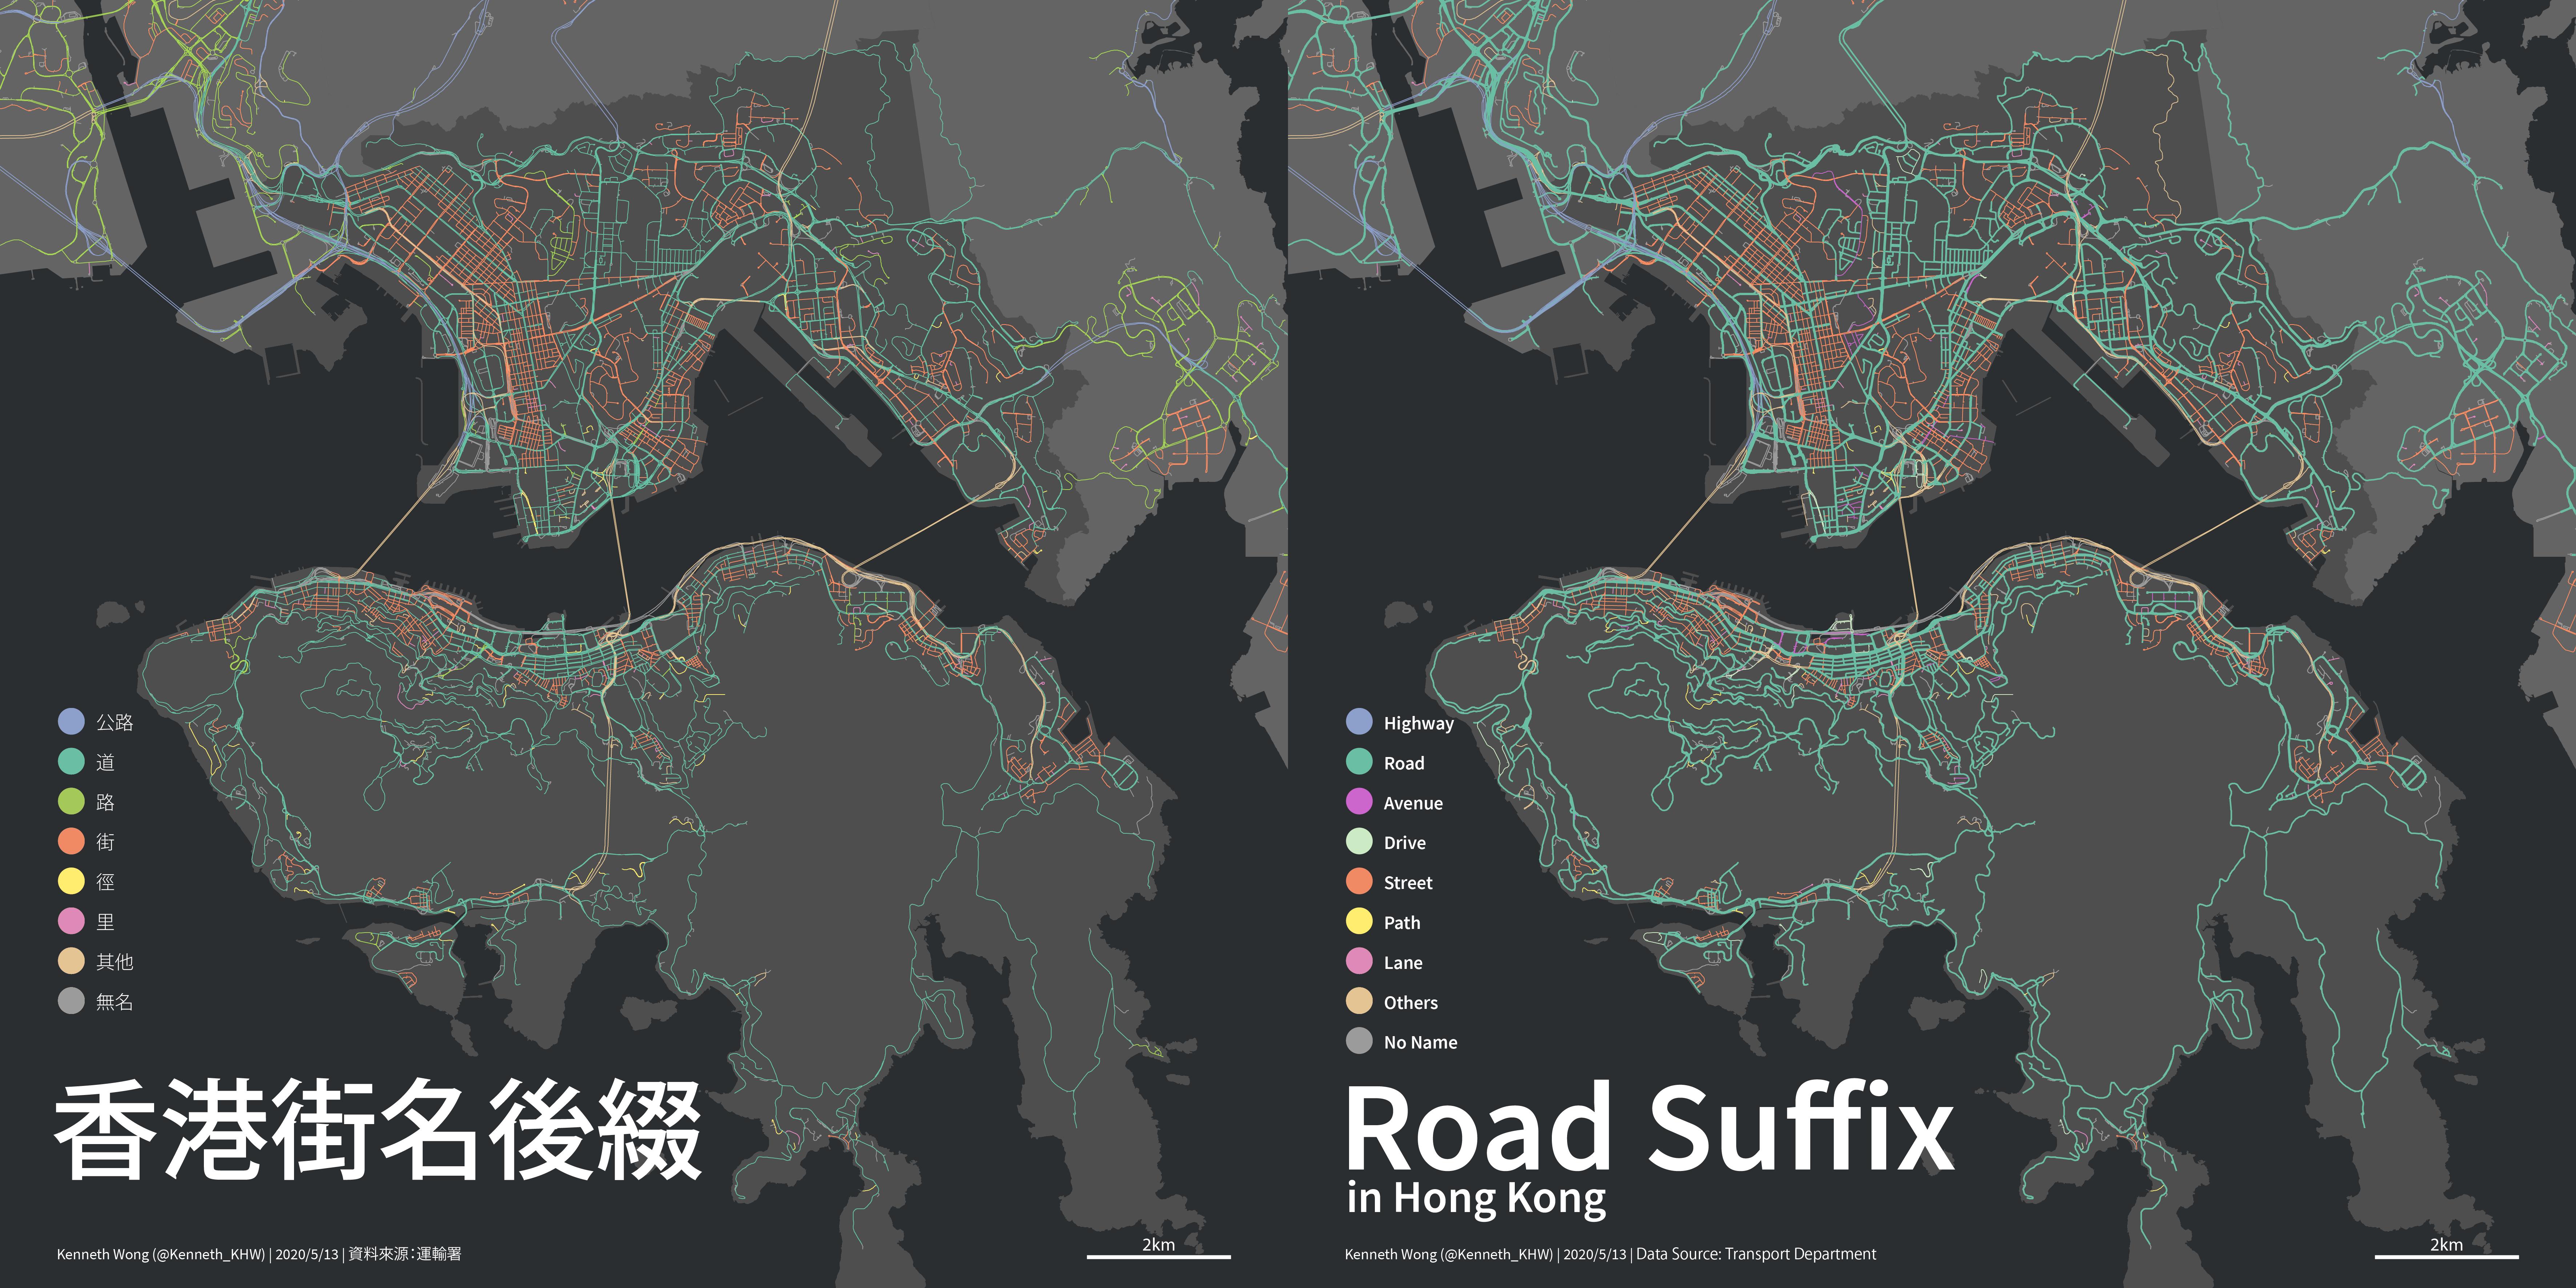 2020-05-street-suffix/CoreUrban_CHIENG.png